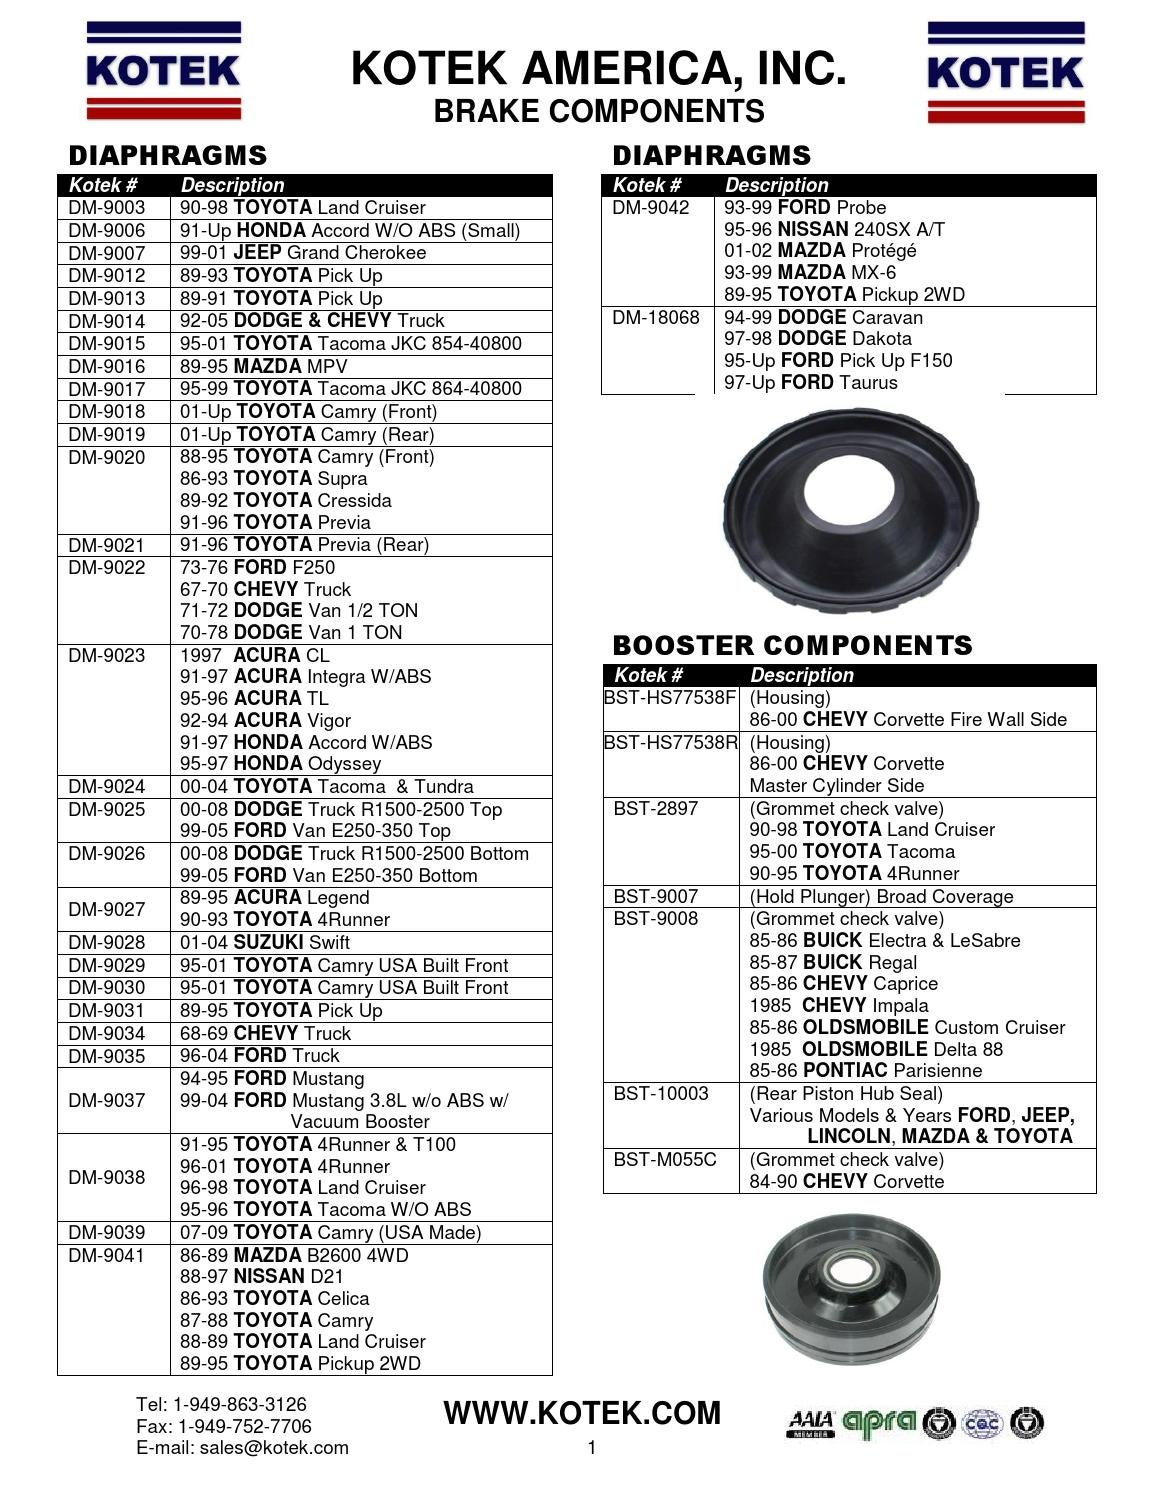 brake components flyer by kotek sealkits